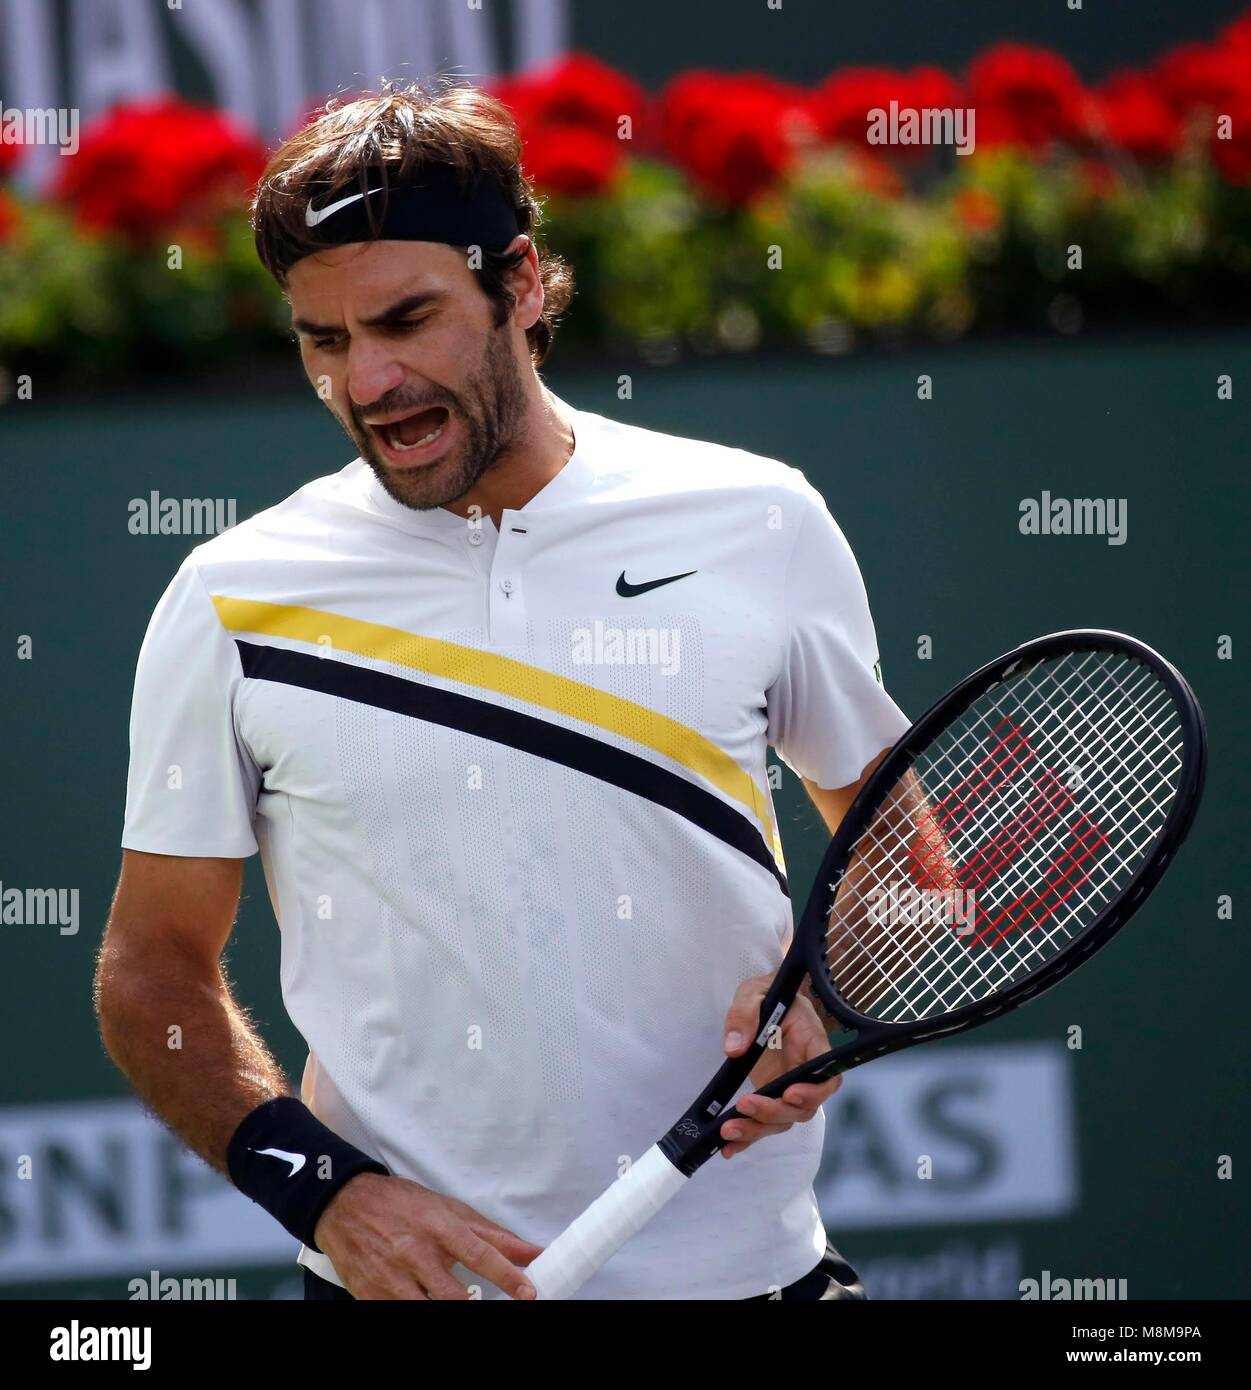 creciendo Atlético lava  Indian Wells, USA. 18th Mar, 2018. Roger Federer of Switzerland Stock Photo  - Alamy